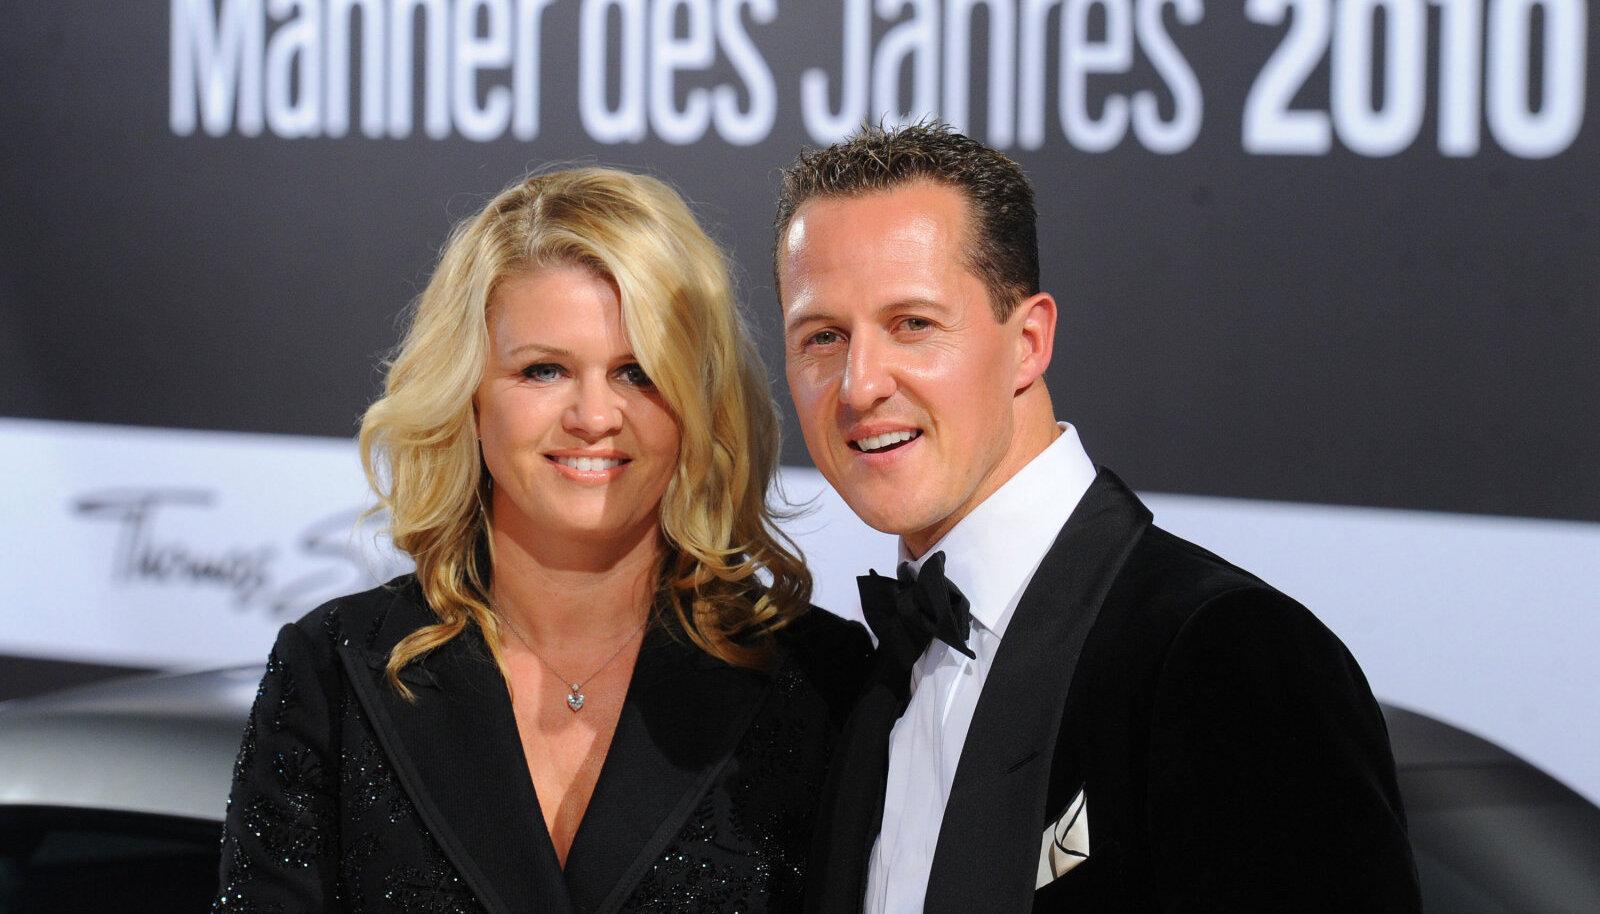 Corinna ja Michael Schumacher 2010. aastal.